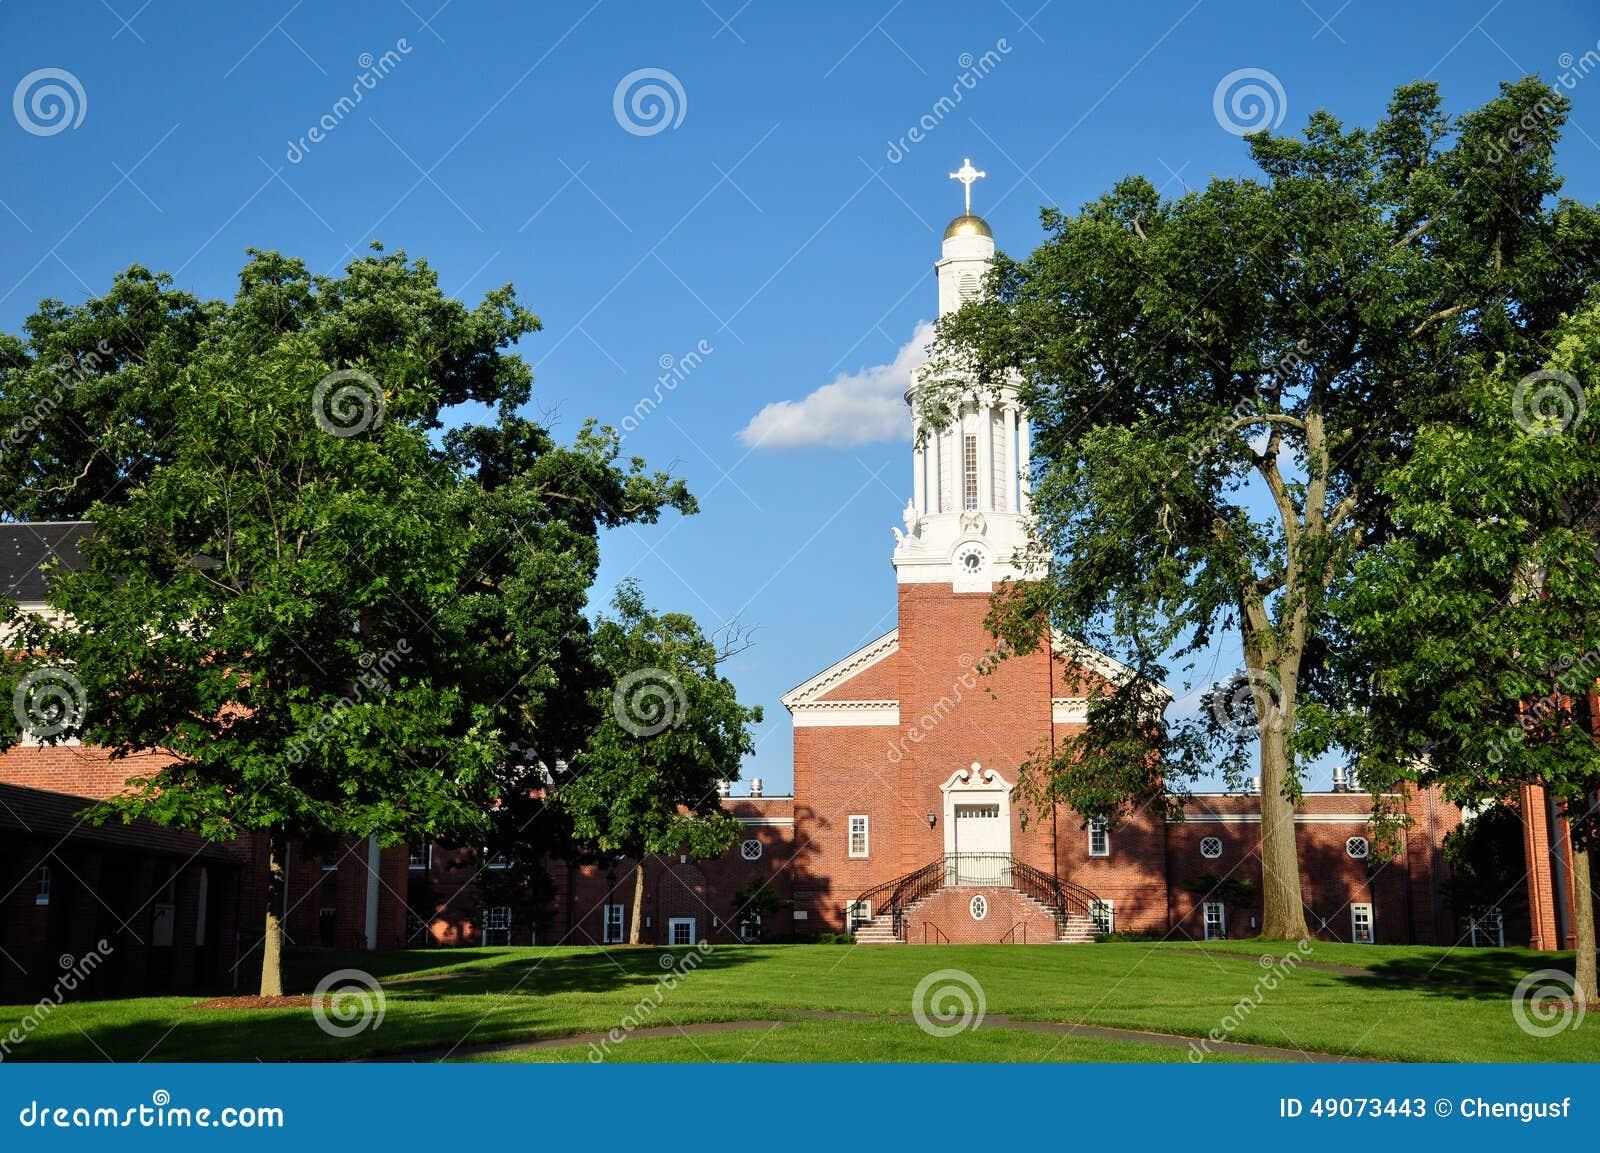 yale college undergraduate majors timecom share price